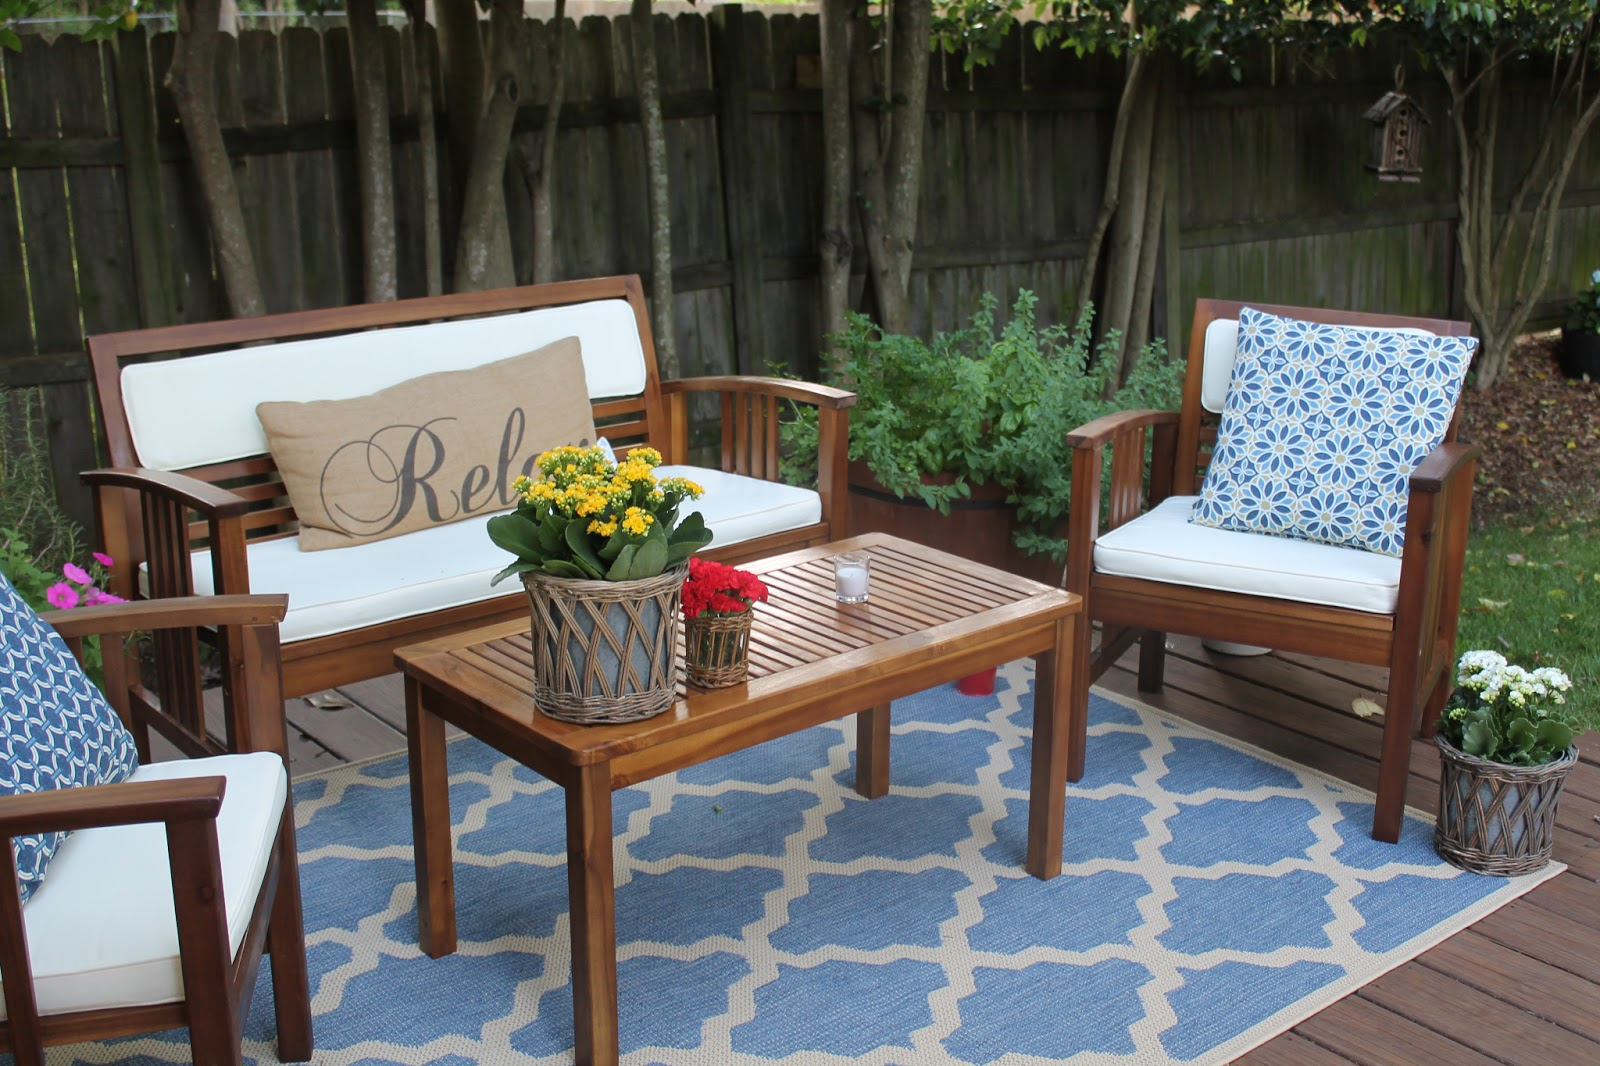 Patio Bench And Patio World Gsmxm Cnxconsortium Org Outdoor with regard to proportions 1600 X 1066 & Outdoor Patio Furniture Temecula Ca u2022 Patio Ideas